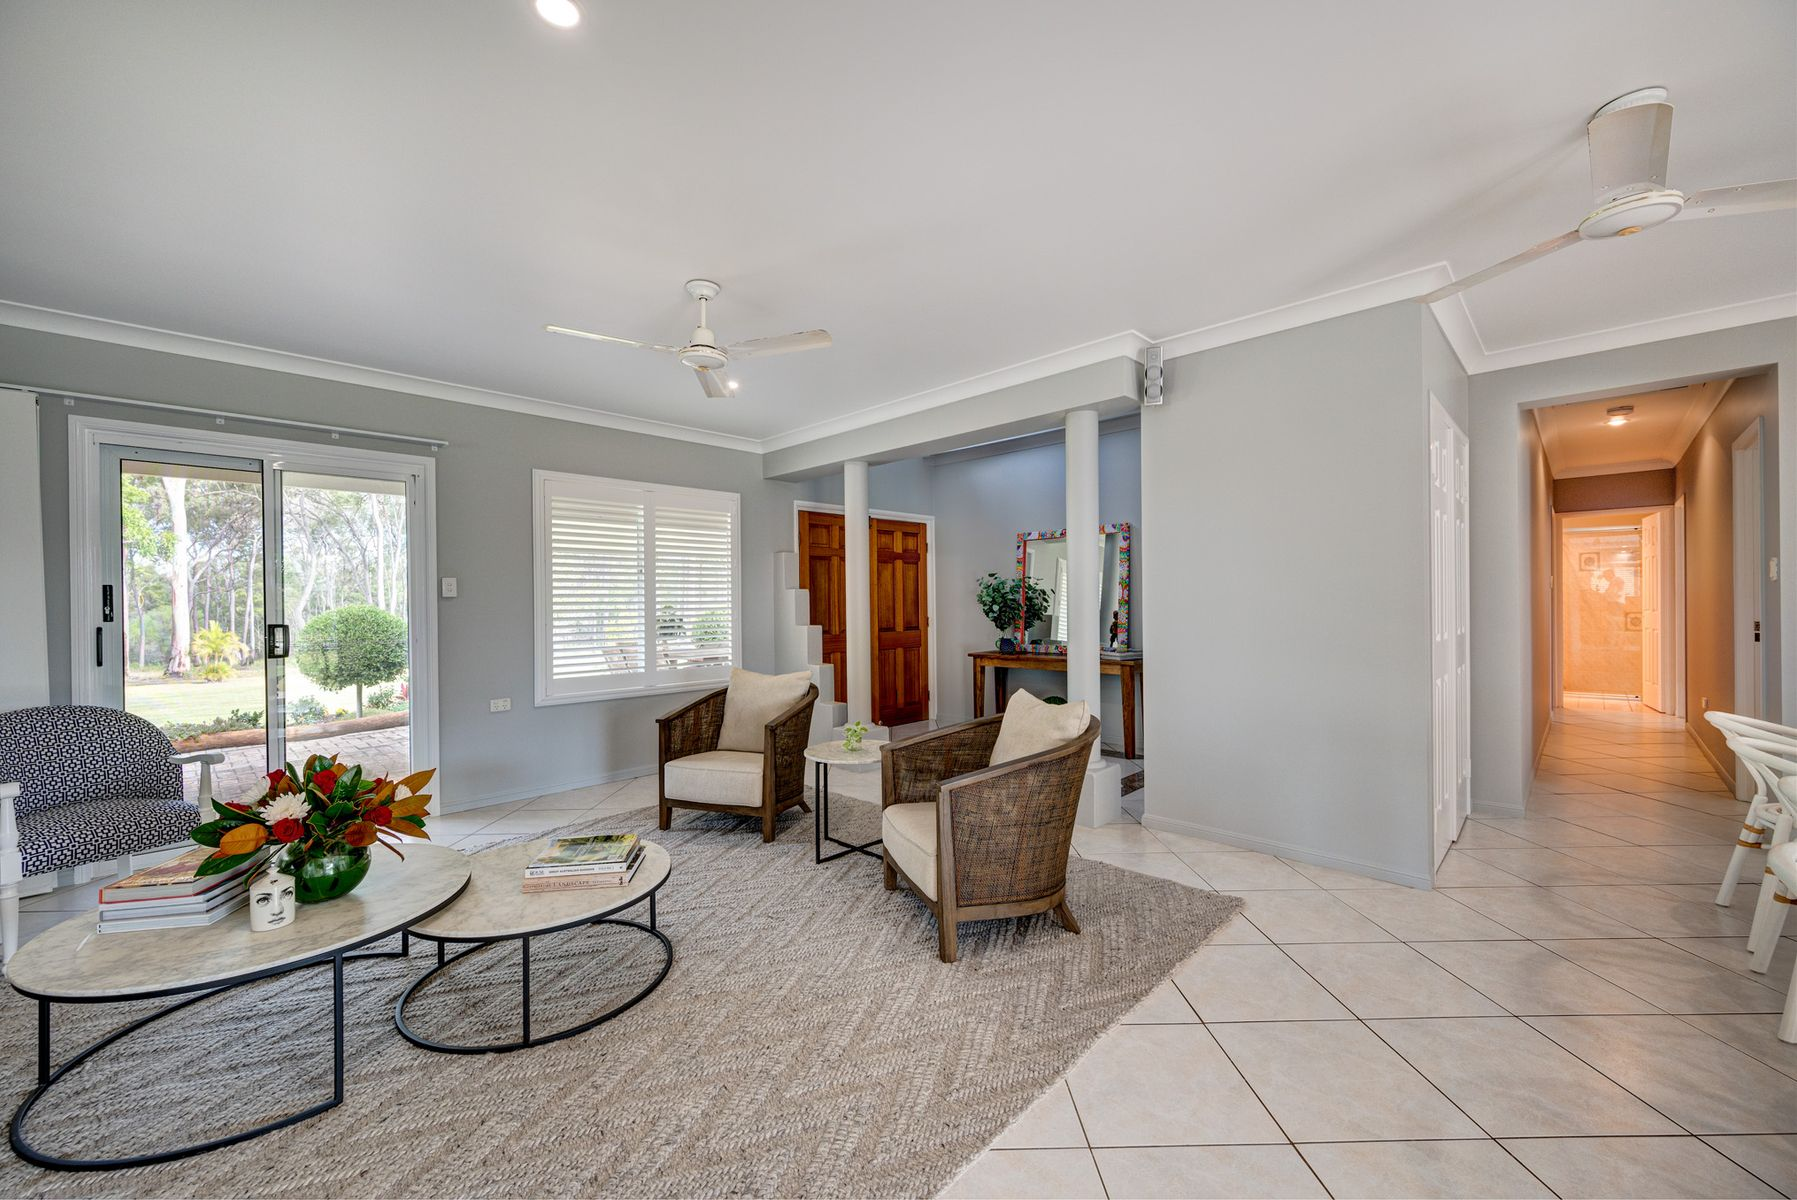 2034 Rosedale Road, Avondale, QLD 4670